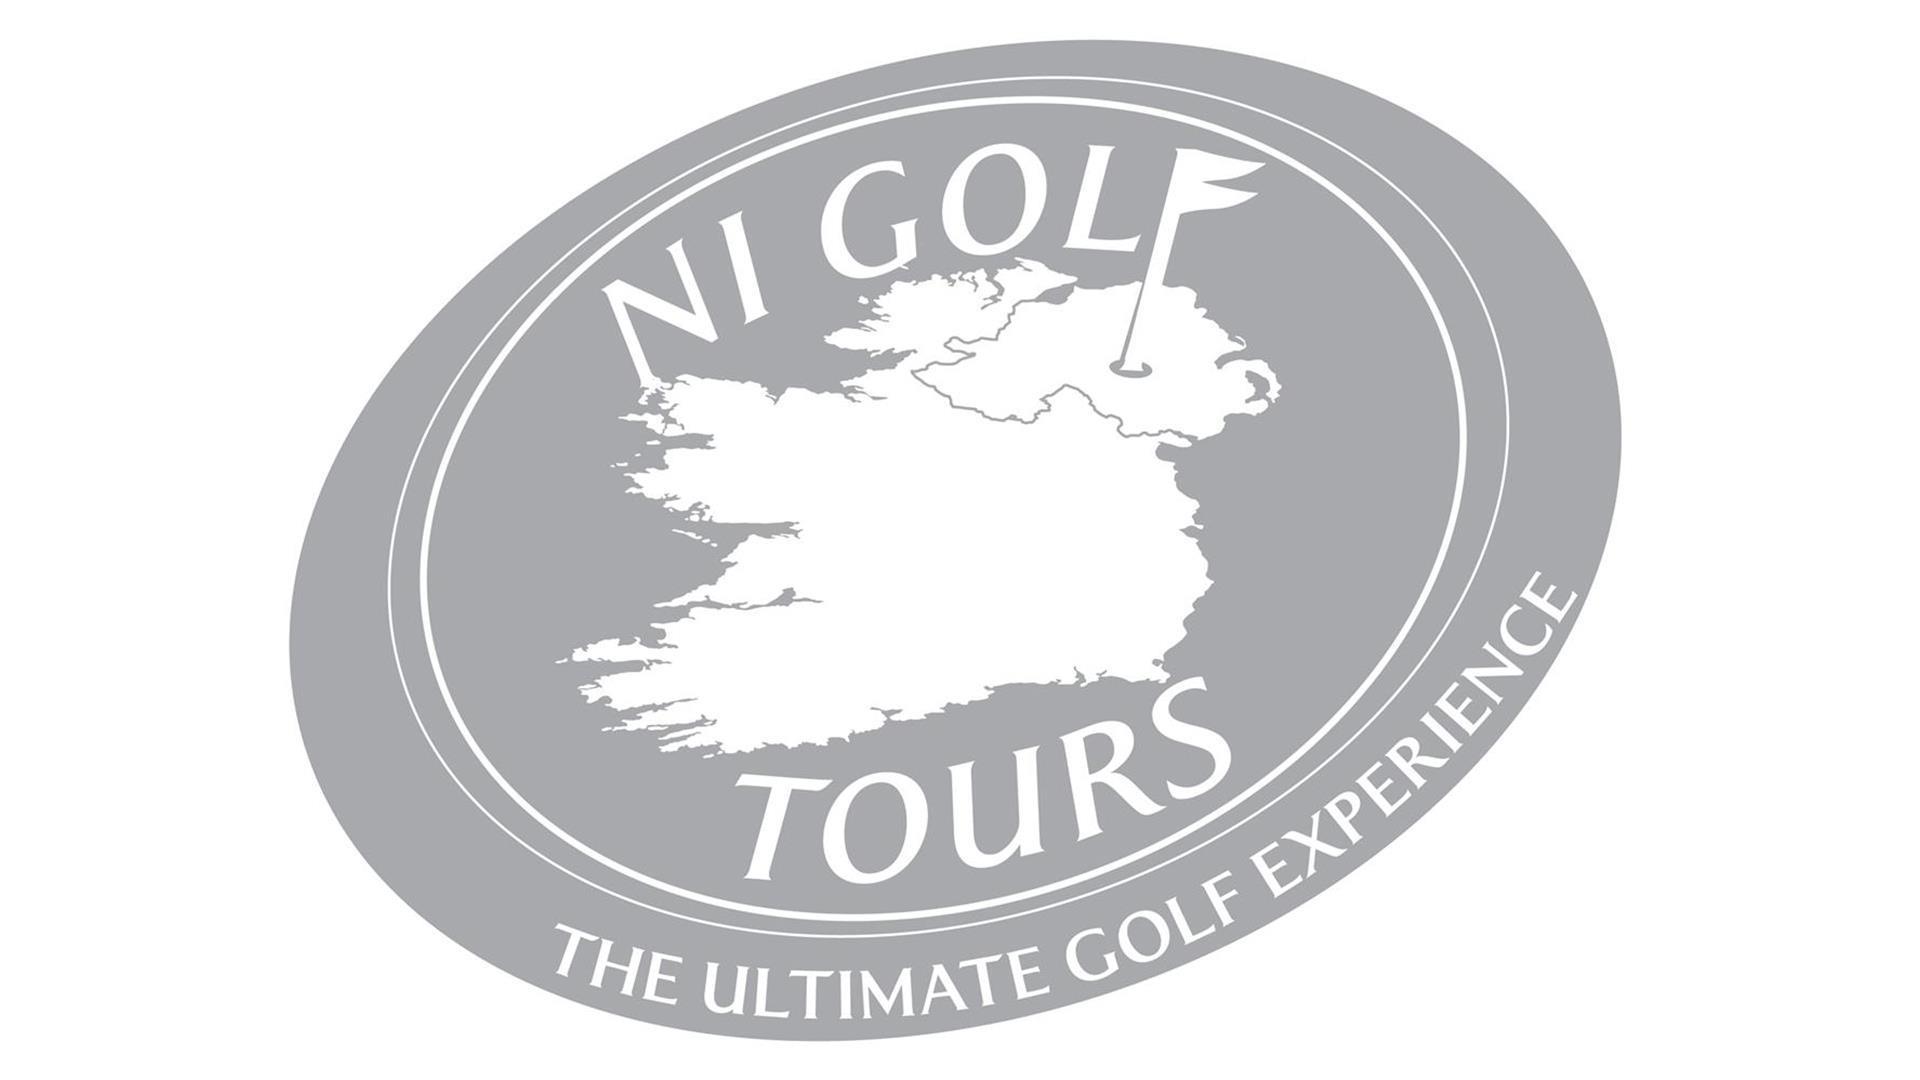 NI Golf Tours